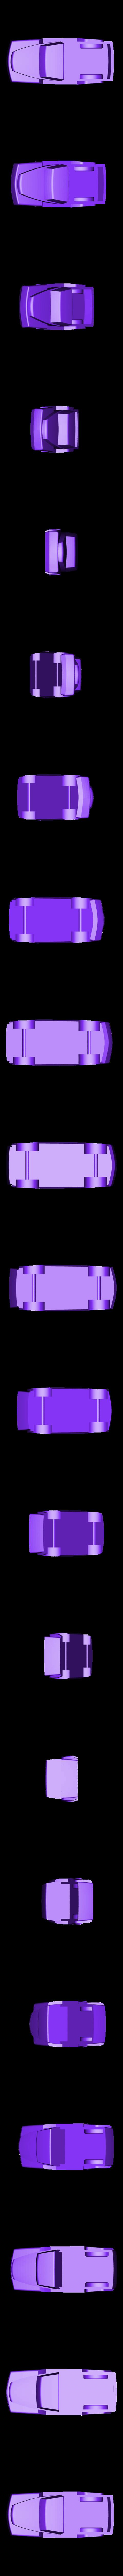 Truck_body.stl Download free STL file Pickup Truck • 3D printable template, WallTosh